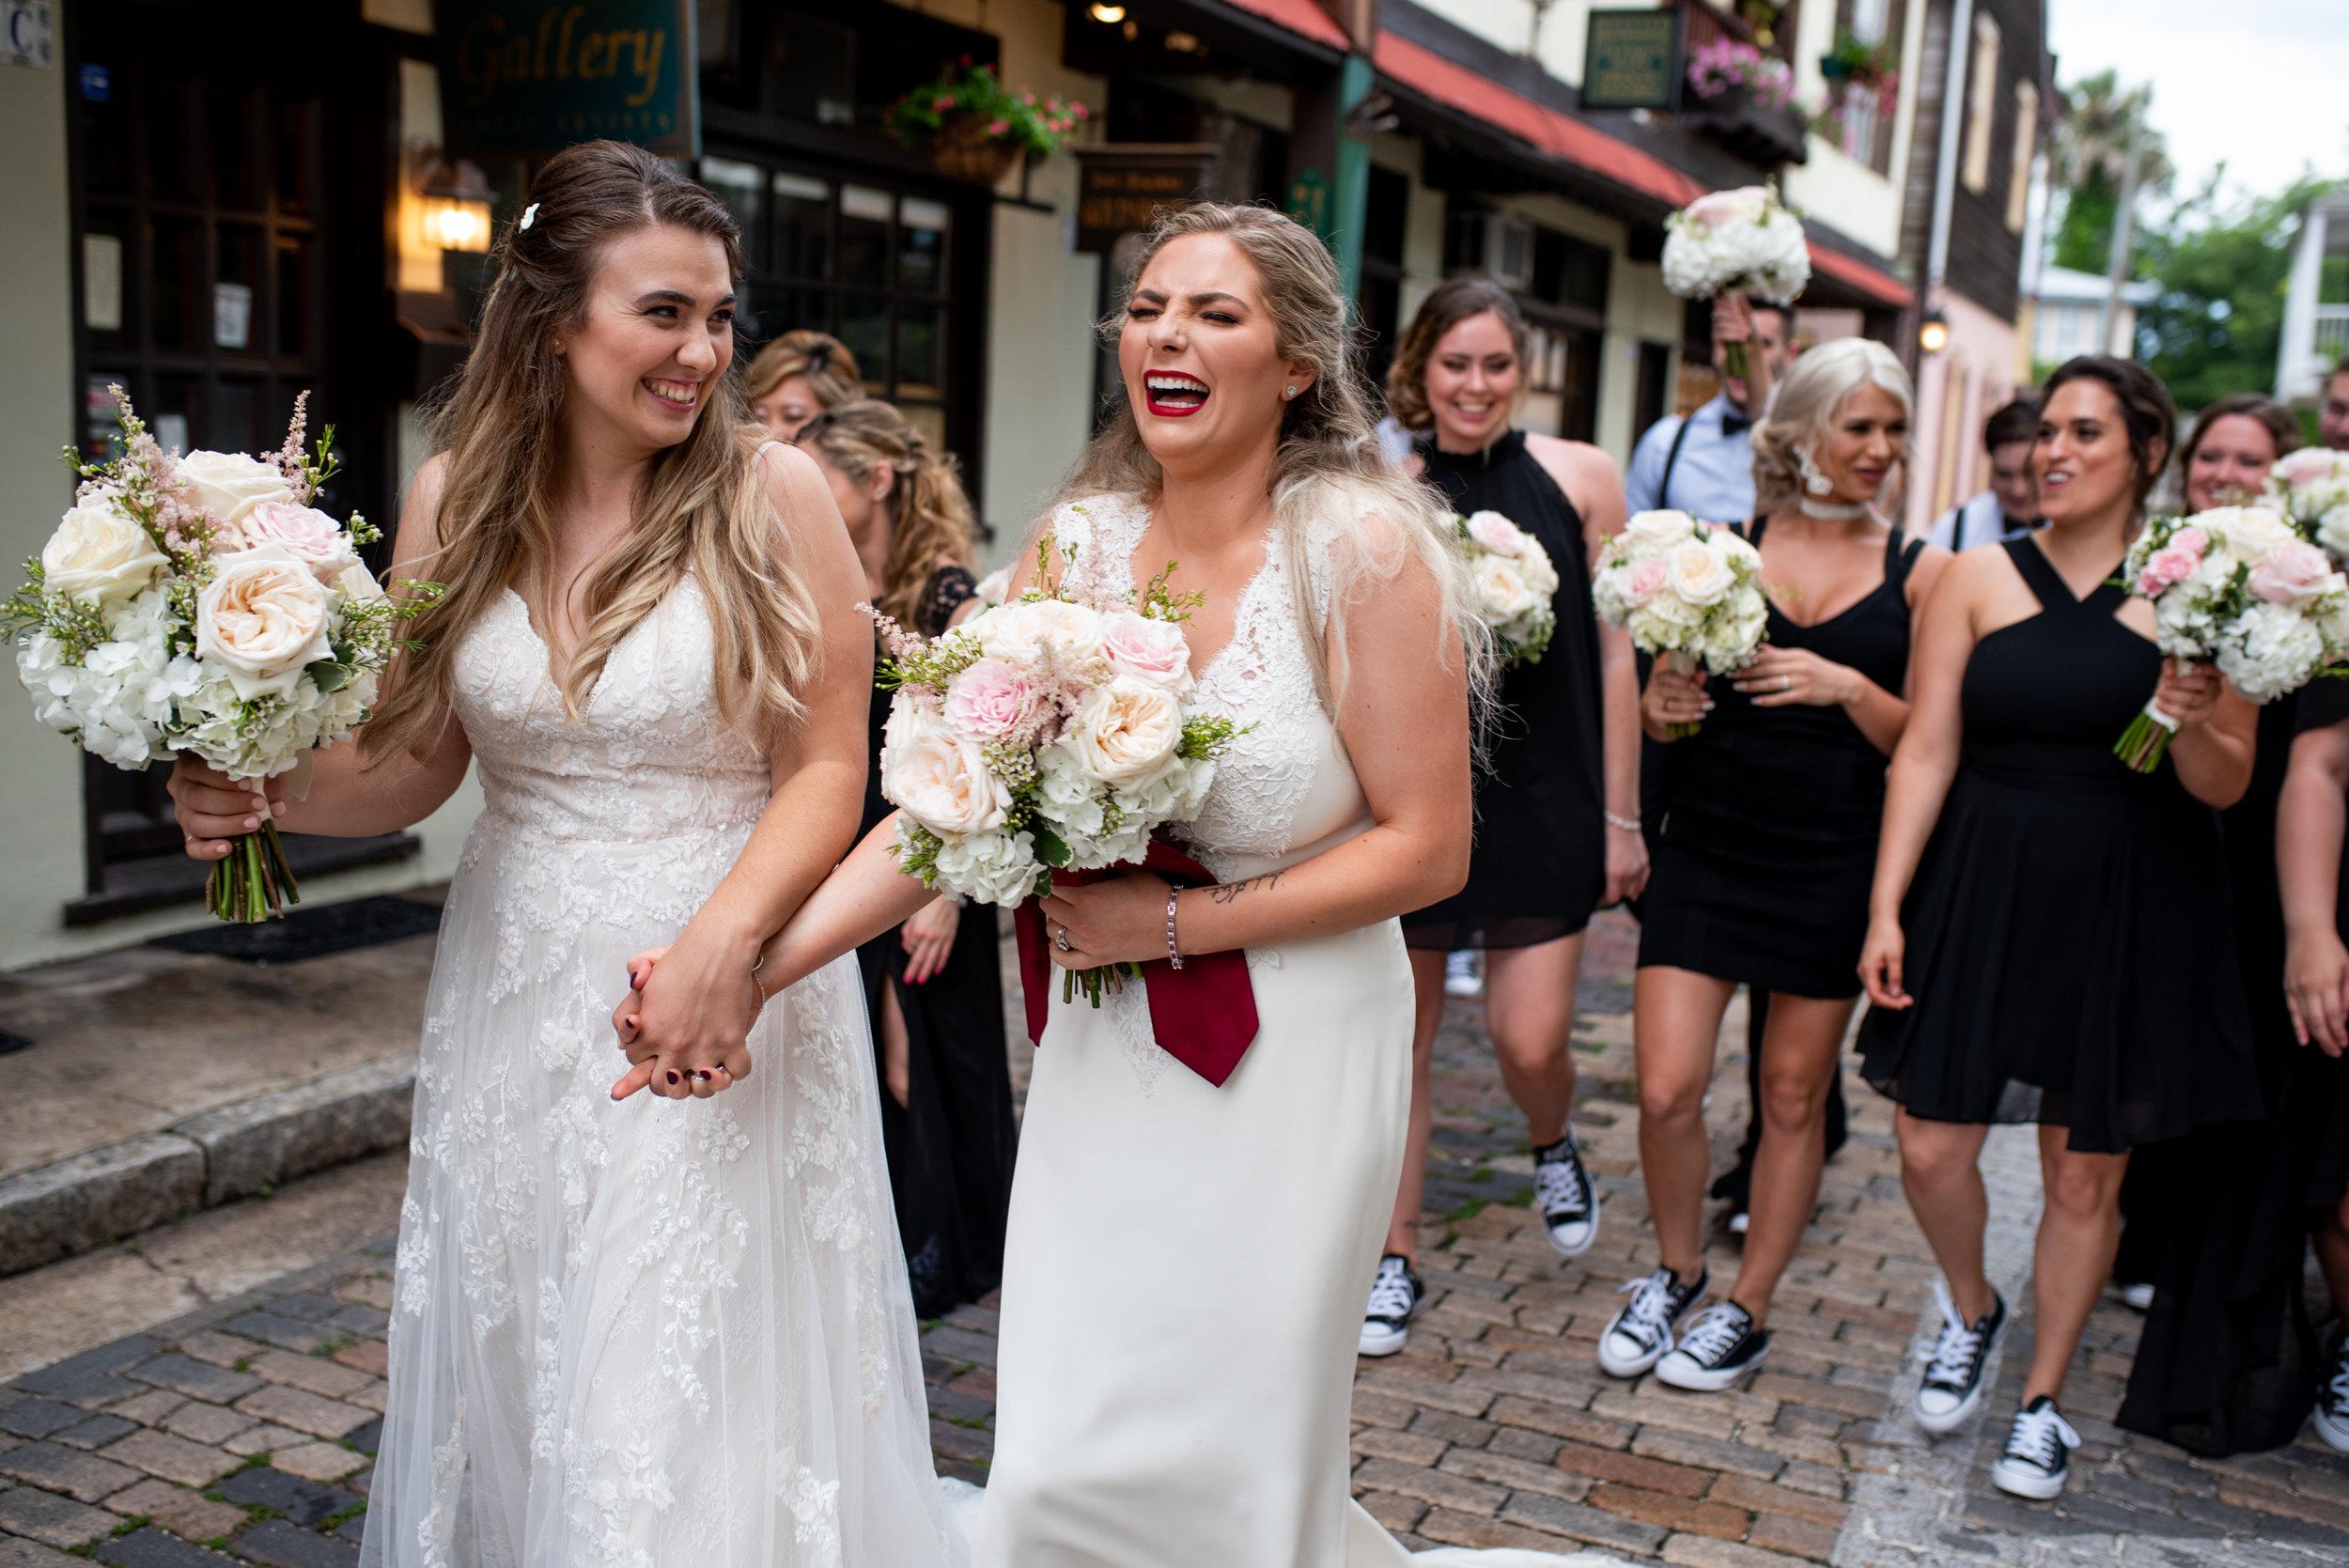 st-augustine-photographer-st-augustine-gay-wedding-sam-sex-wedding-photographer-sarah-annay-photography-white-room-weddings-39.jpg